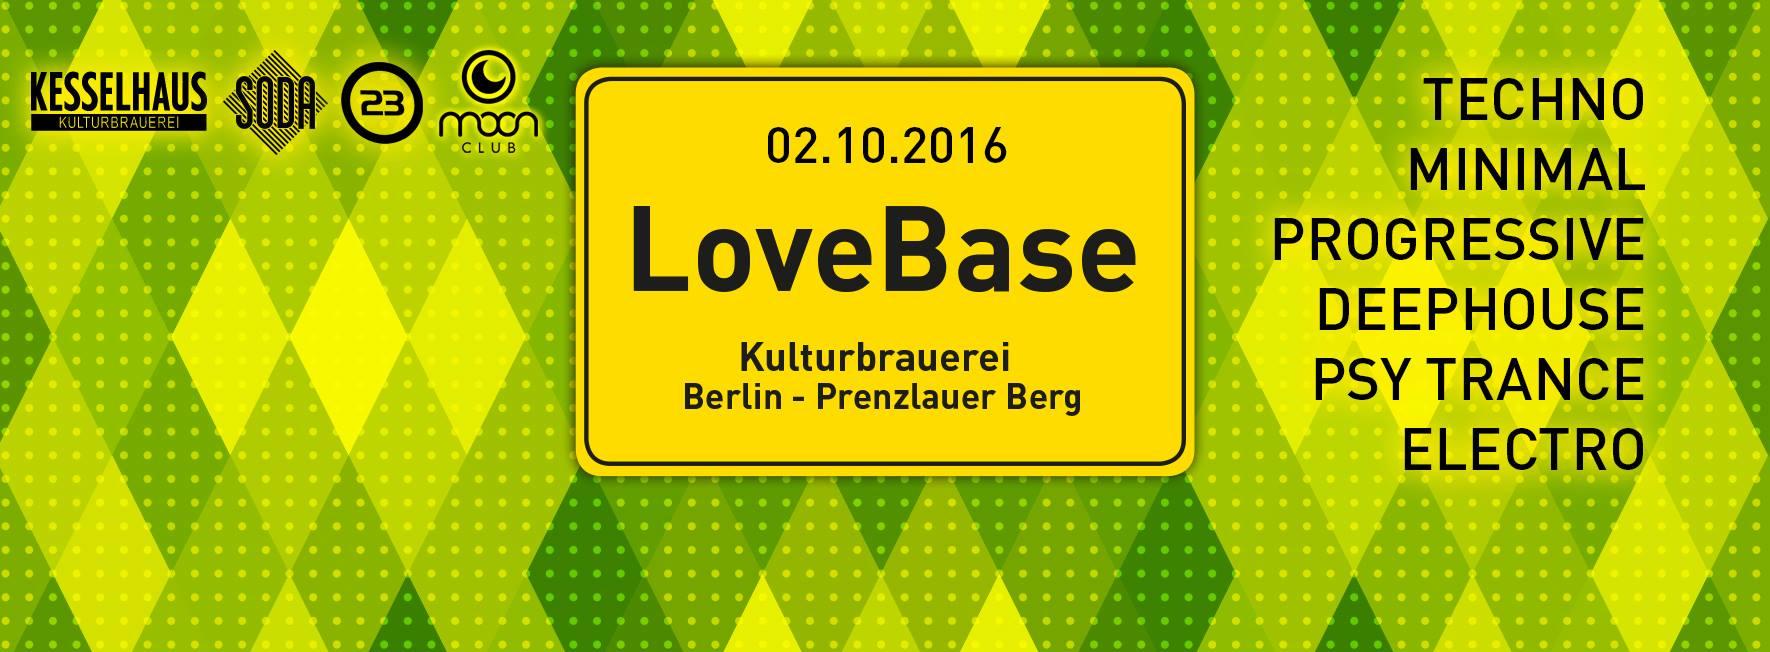 LOVEBASE @Kulturbrauerei Berlin